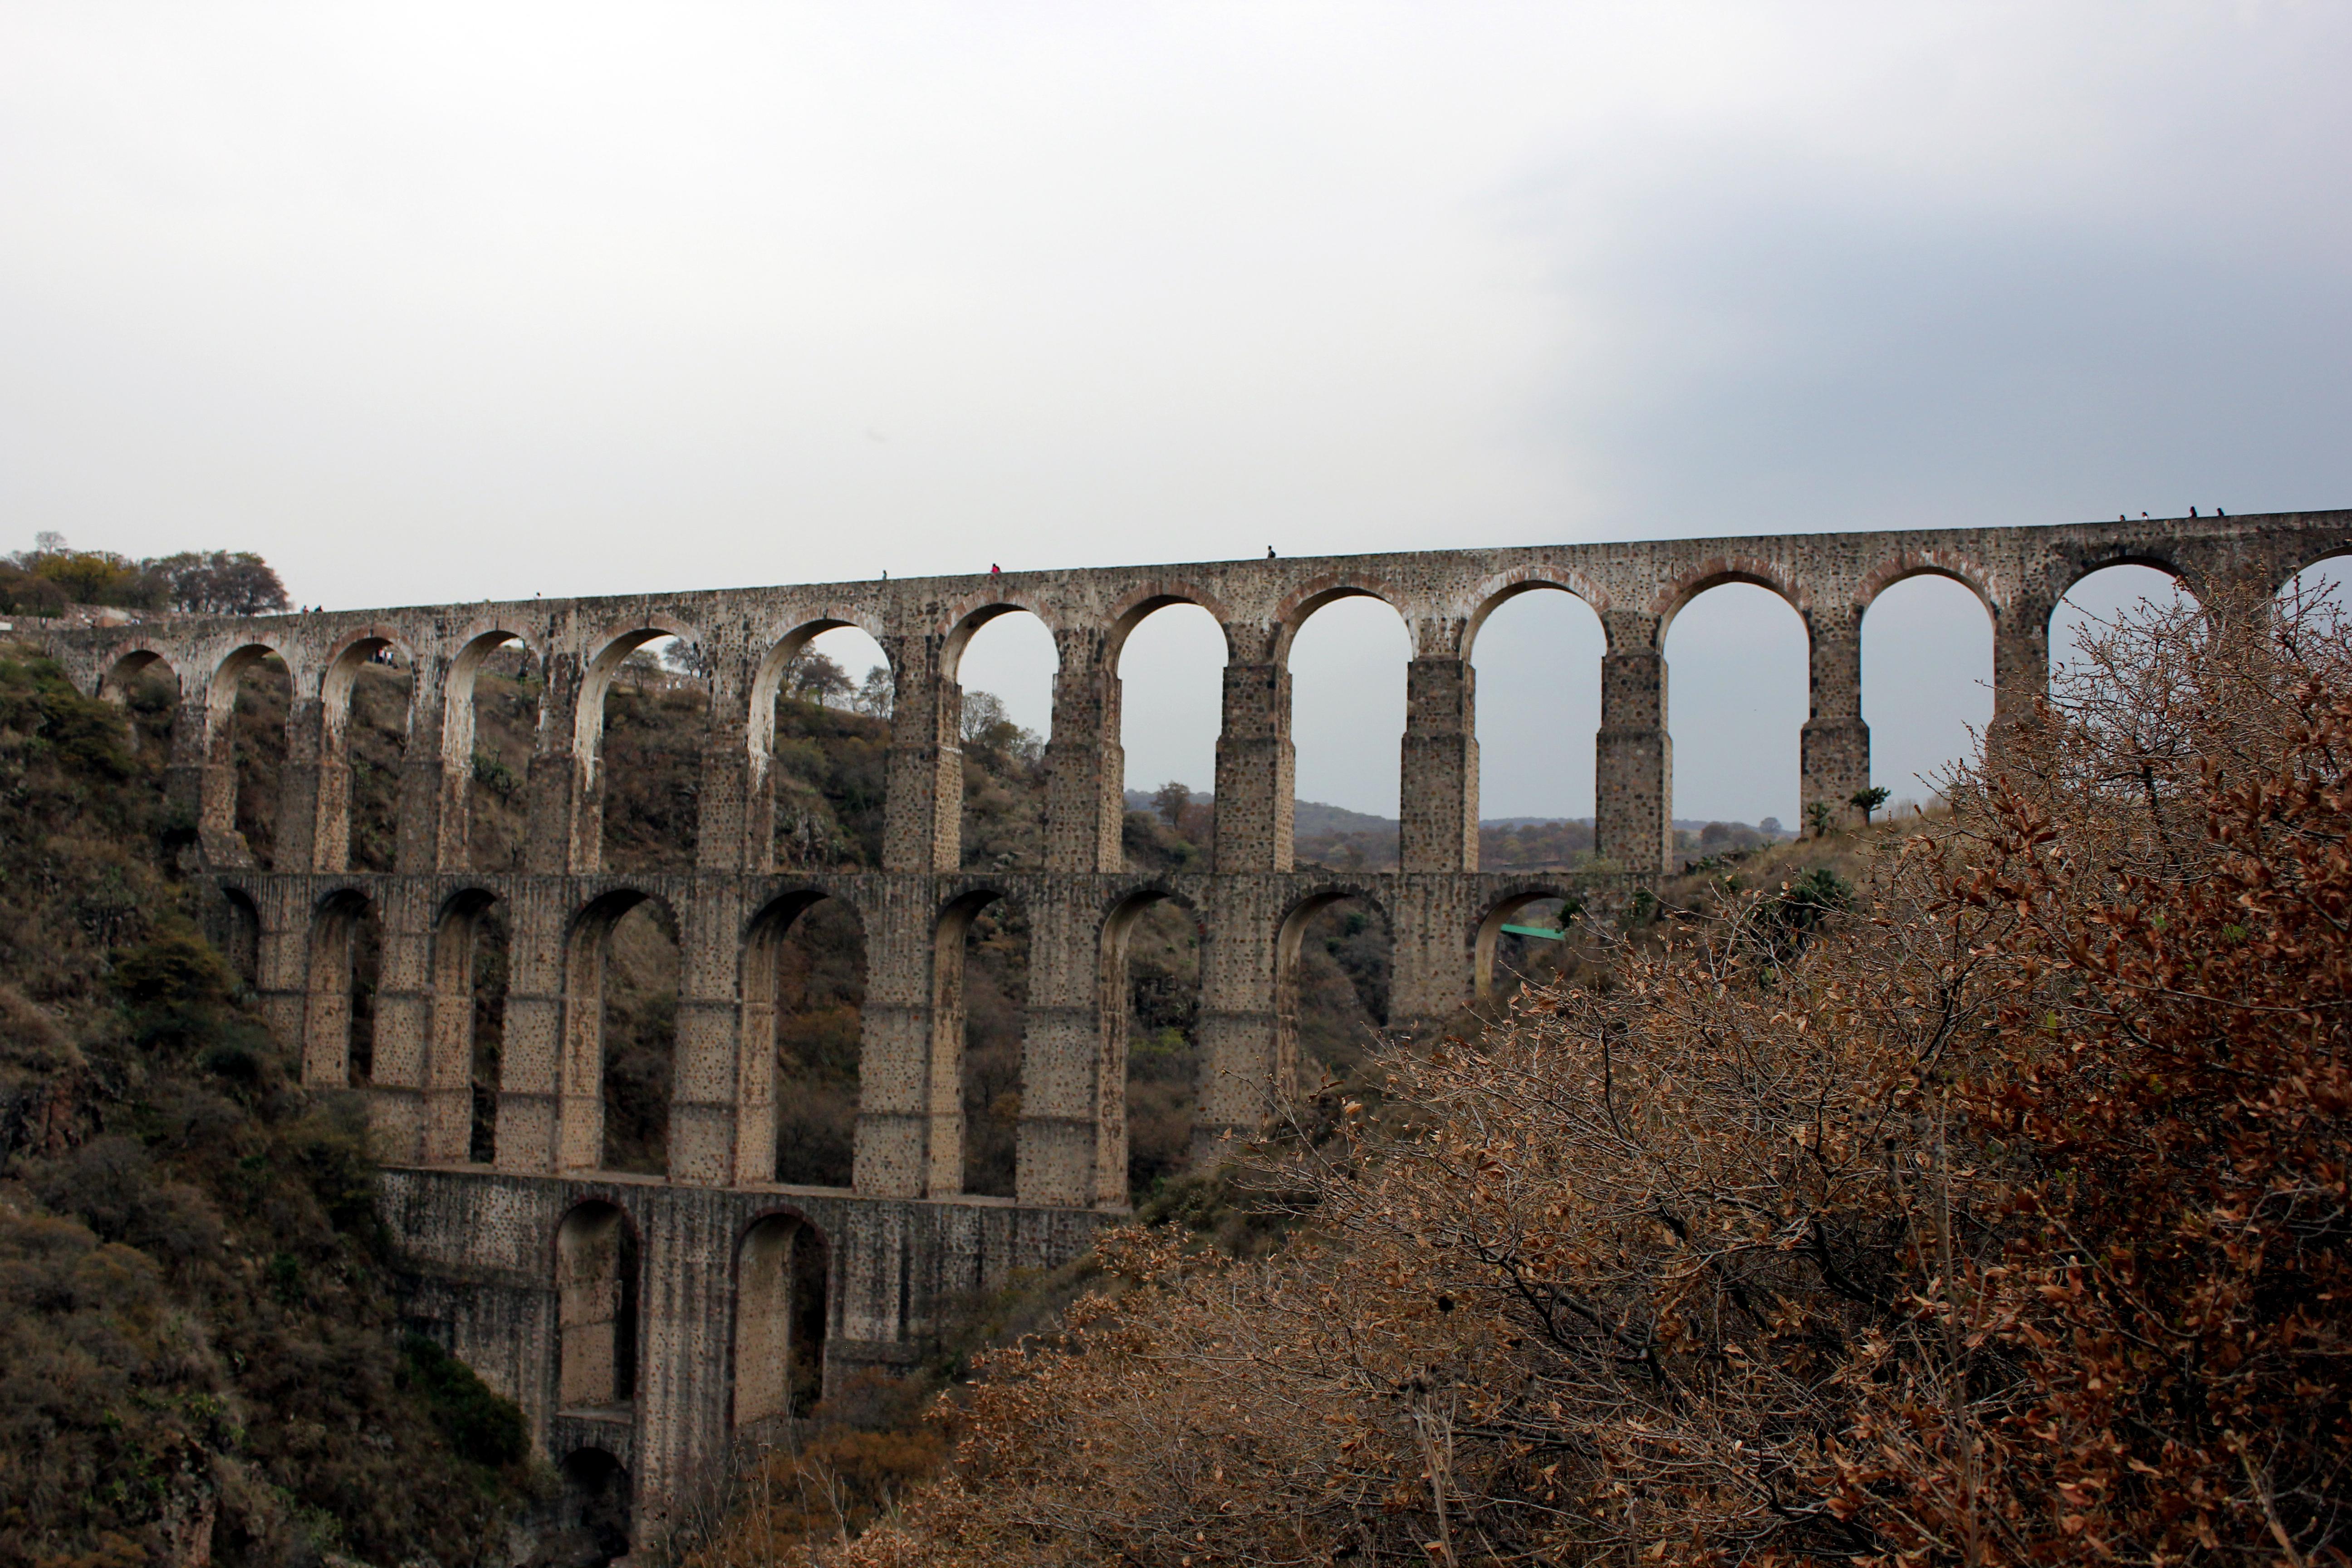 File:Acueducto, Arcos del Sitio, Tepotzotlán, Estado de México.JPG - Wikimedi...